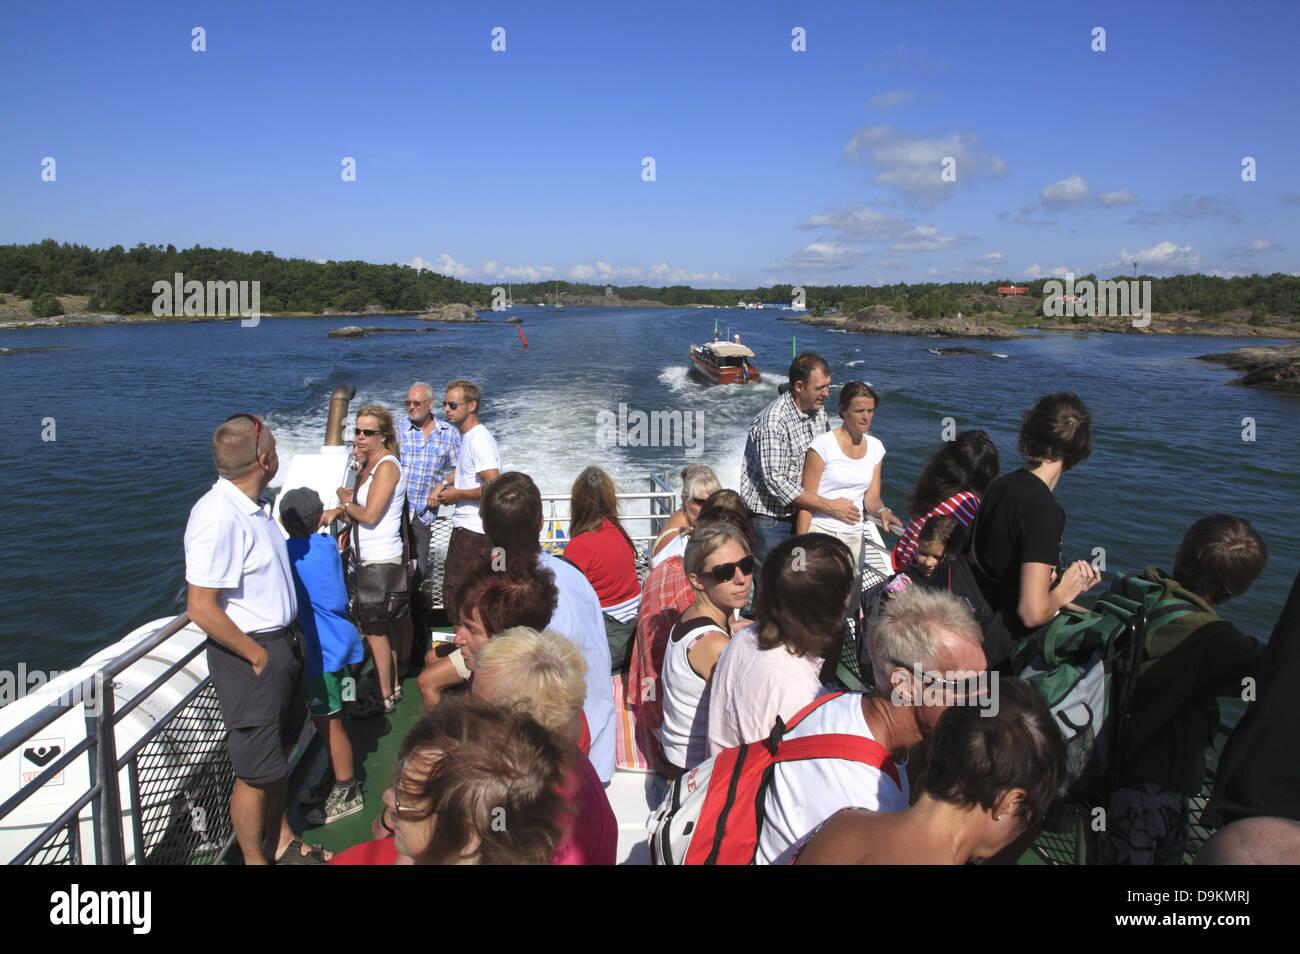 Toroe Island,ferry to Landsort Island (Oeja), Stockholm Archipelago, baltic Sea coast, Sweden, Scandinavia - Stock Image